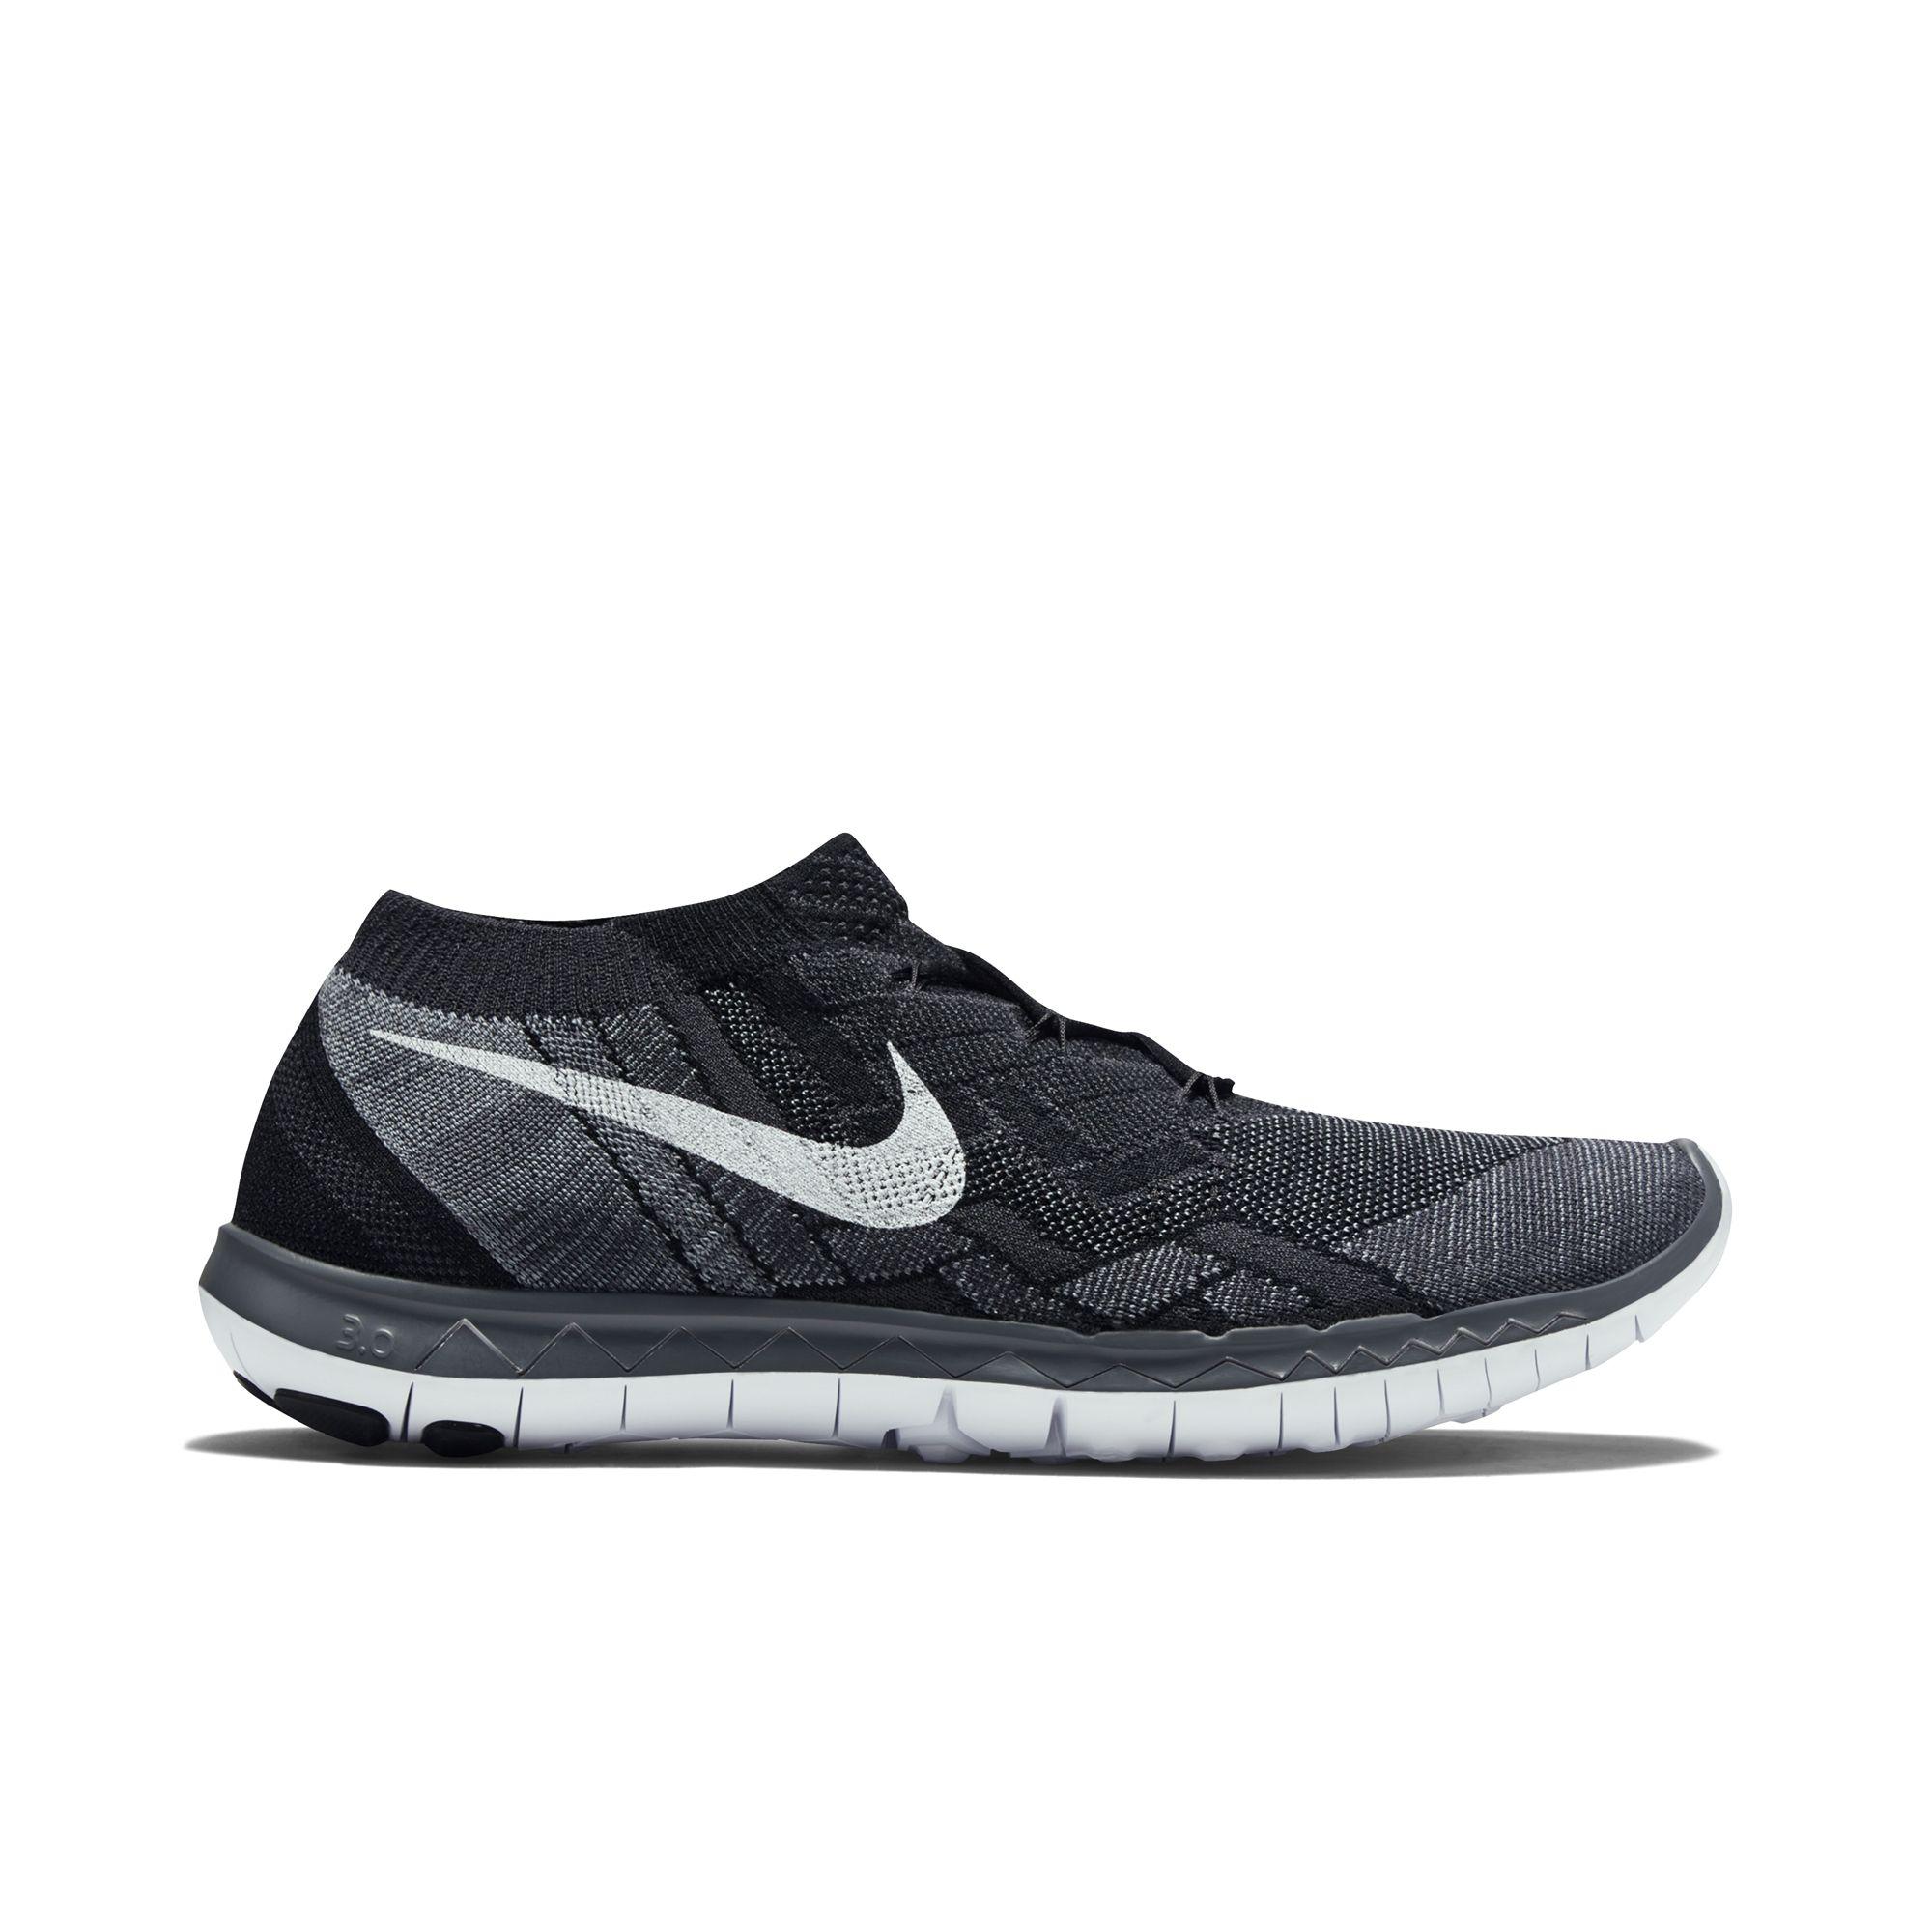 sports shoes b1d89 315c0 TENIS NIKE FREE 3.0 FLYKNIT